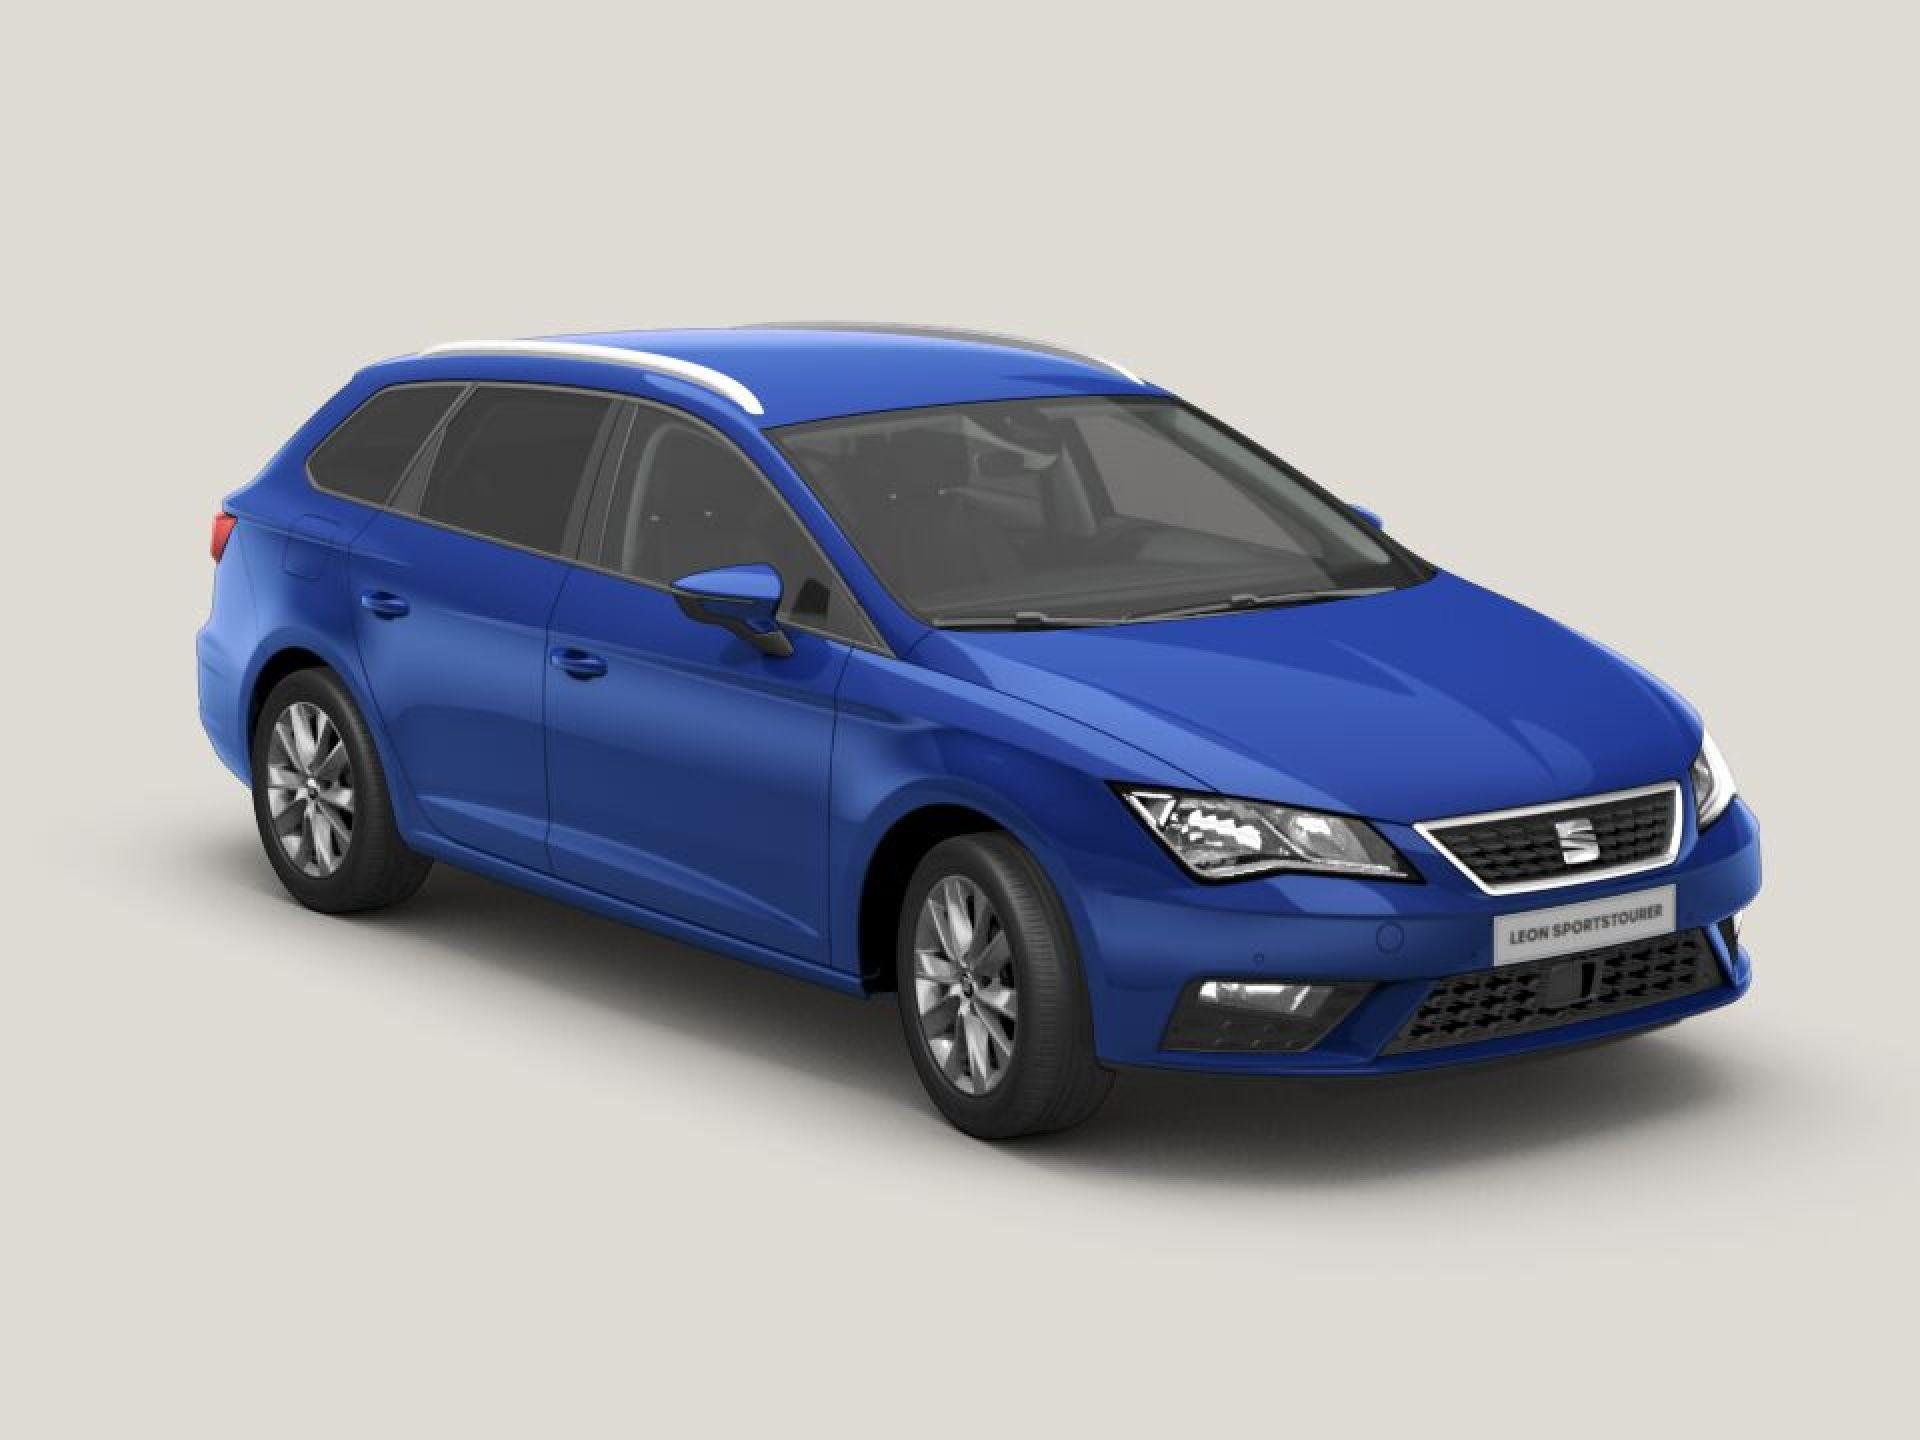 SEAT Leon ST 1.5 EcoTSI 96kW (130CV) S&S Style Ed nuevo Madrid